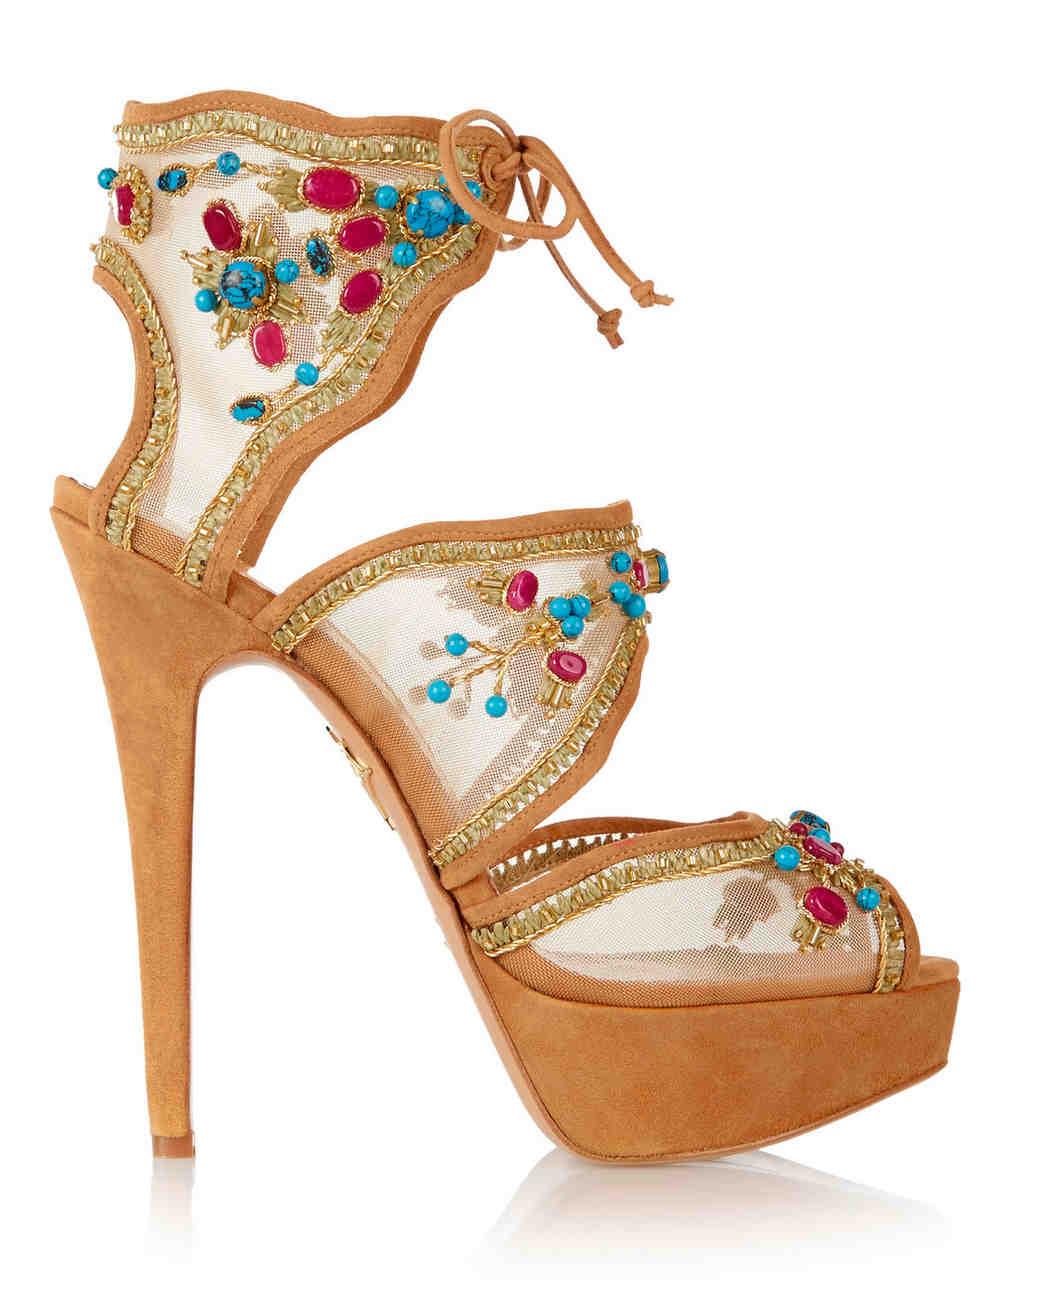 summer-wedding-shoes-charlotte-olympia-arizona-sandals-0515.jpg